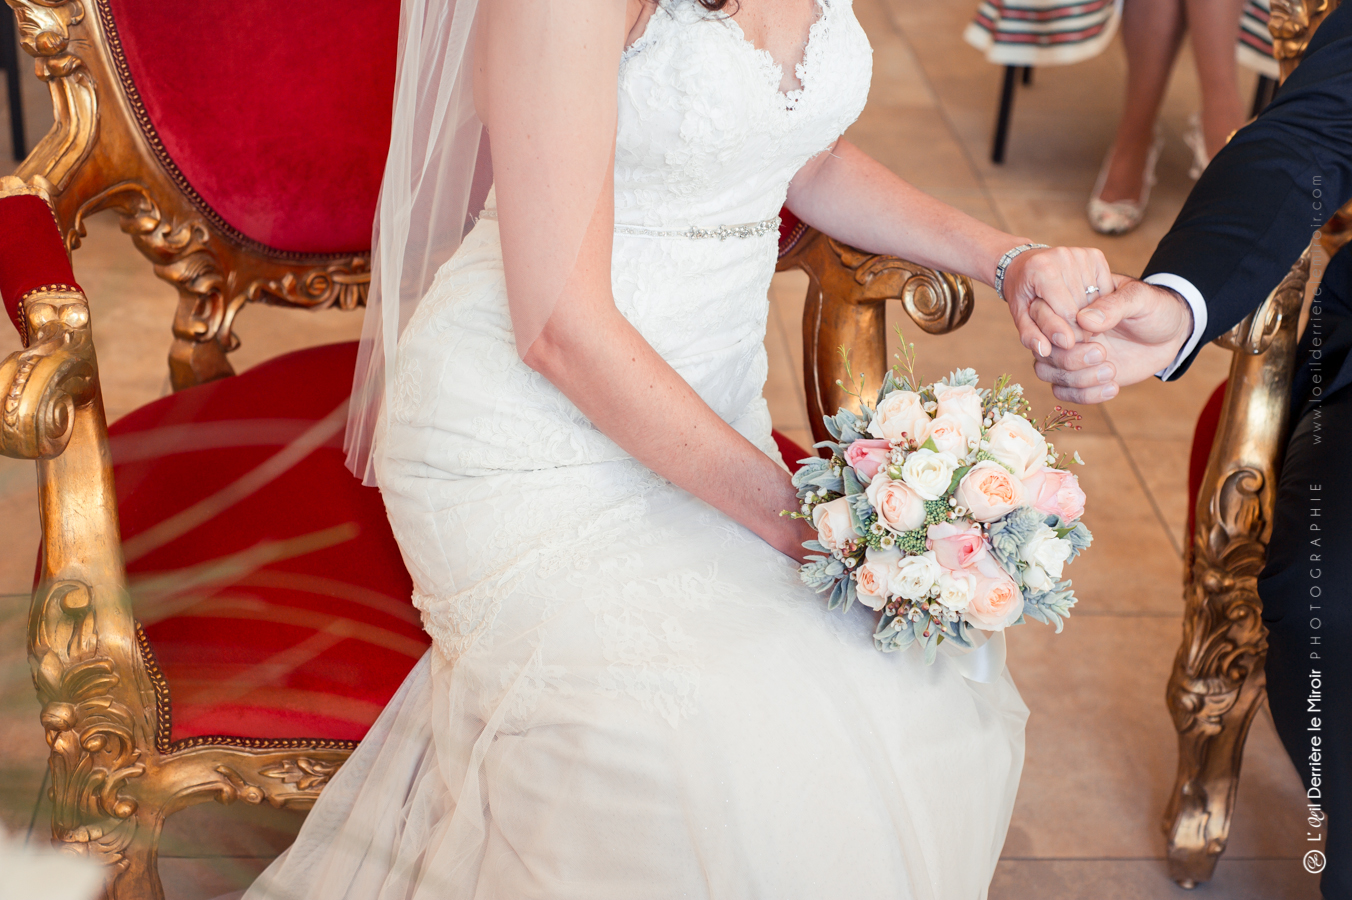 Photographe-mariage-Lorgues-83-KS-037